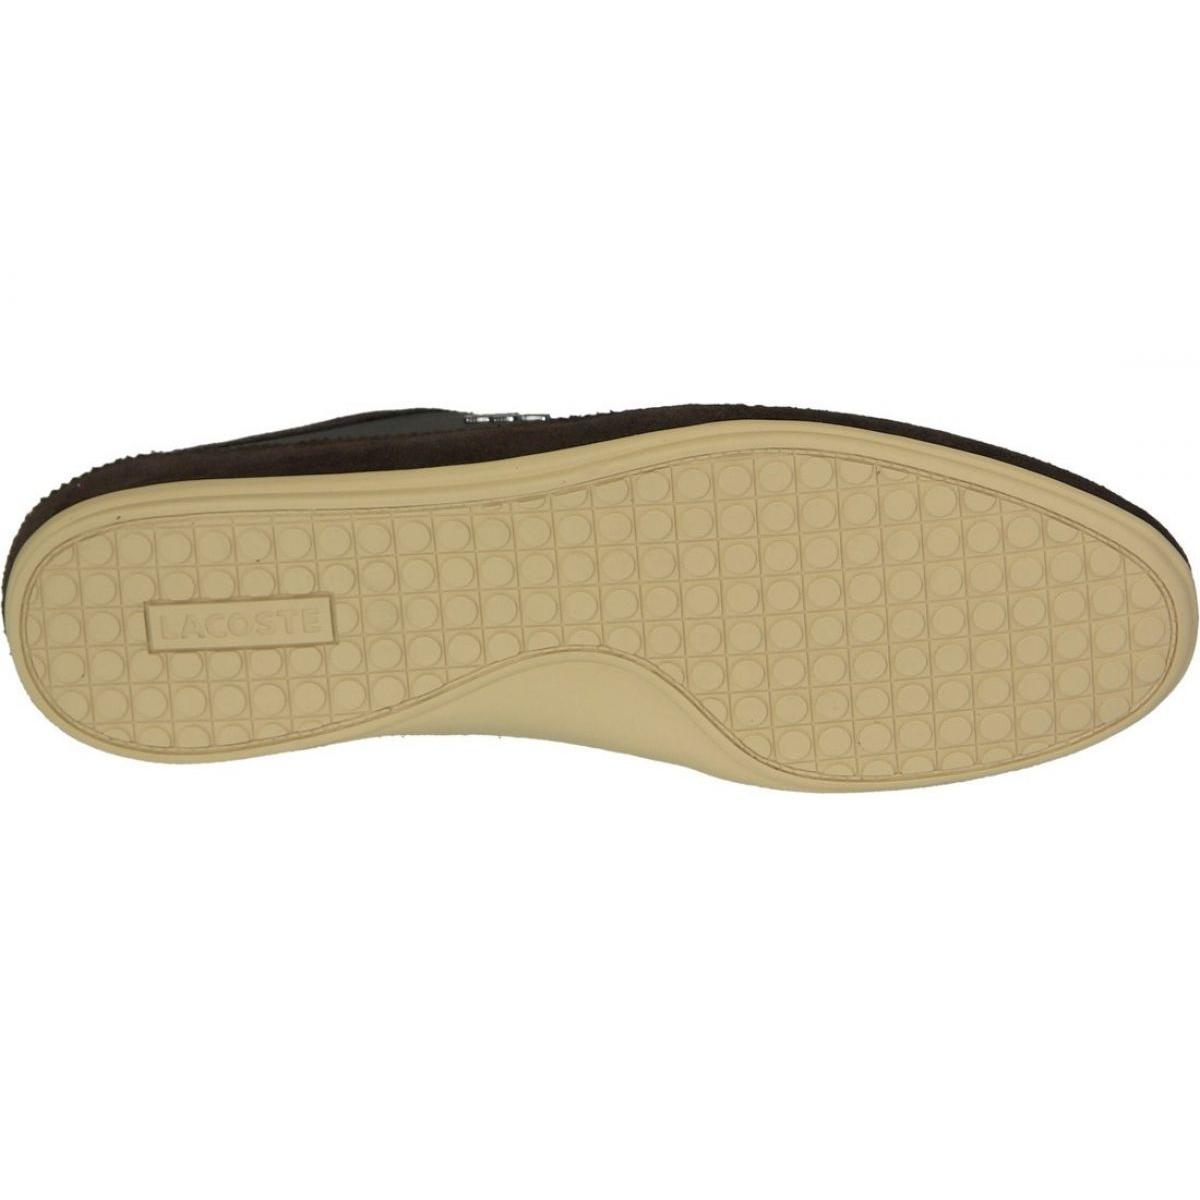 Lacoste-Misano-22-Lcr-M-SRM2146176-shoes-brown thumbnail 4